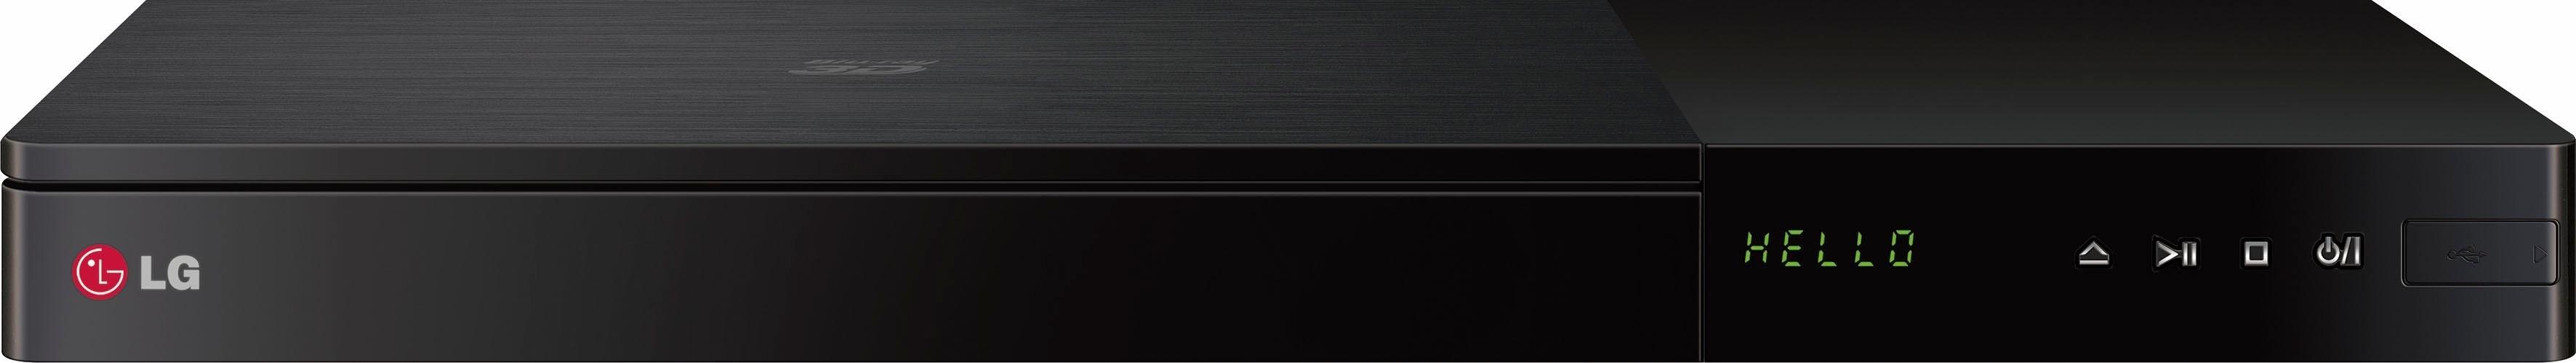 LG BP740B blu-ray-speler, 3D-ready, WLAN nu online bestellen